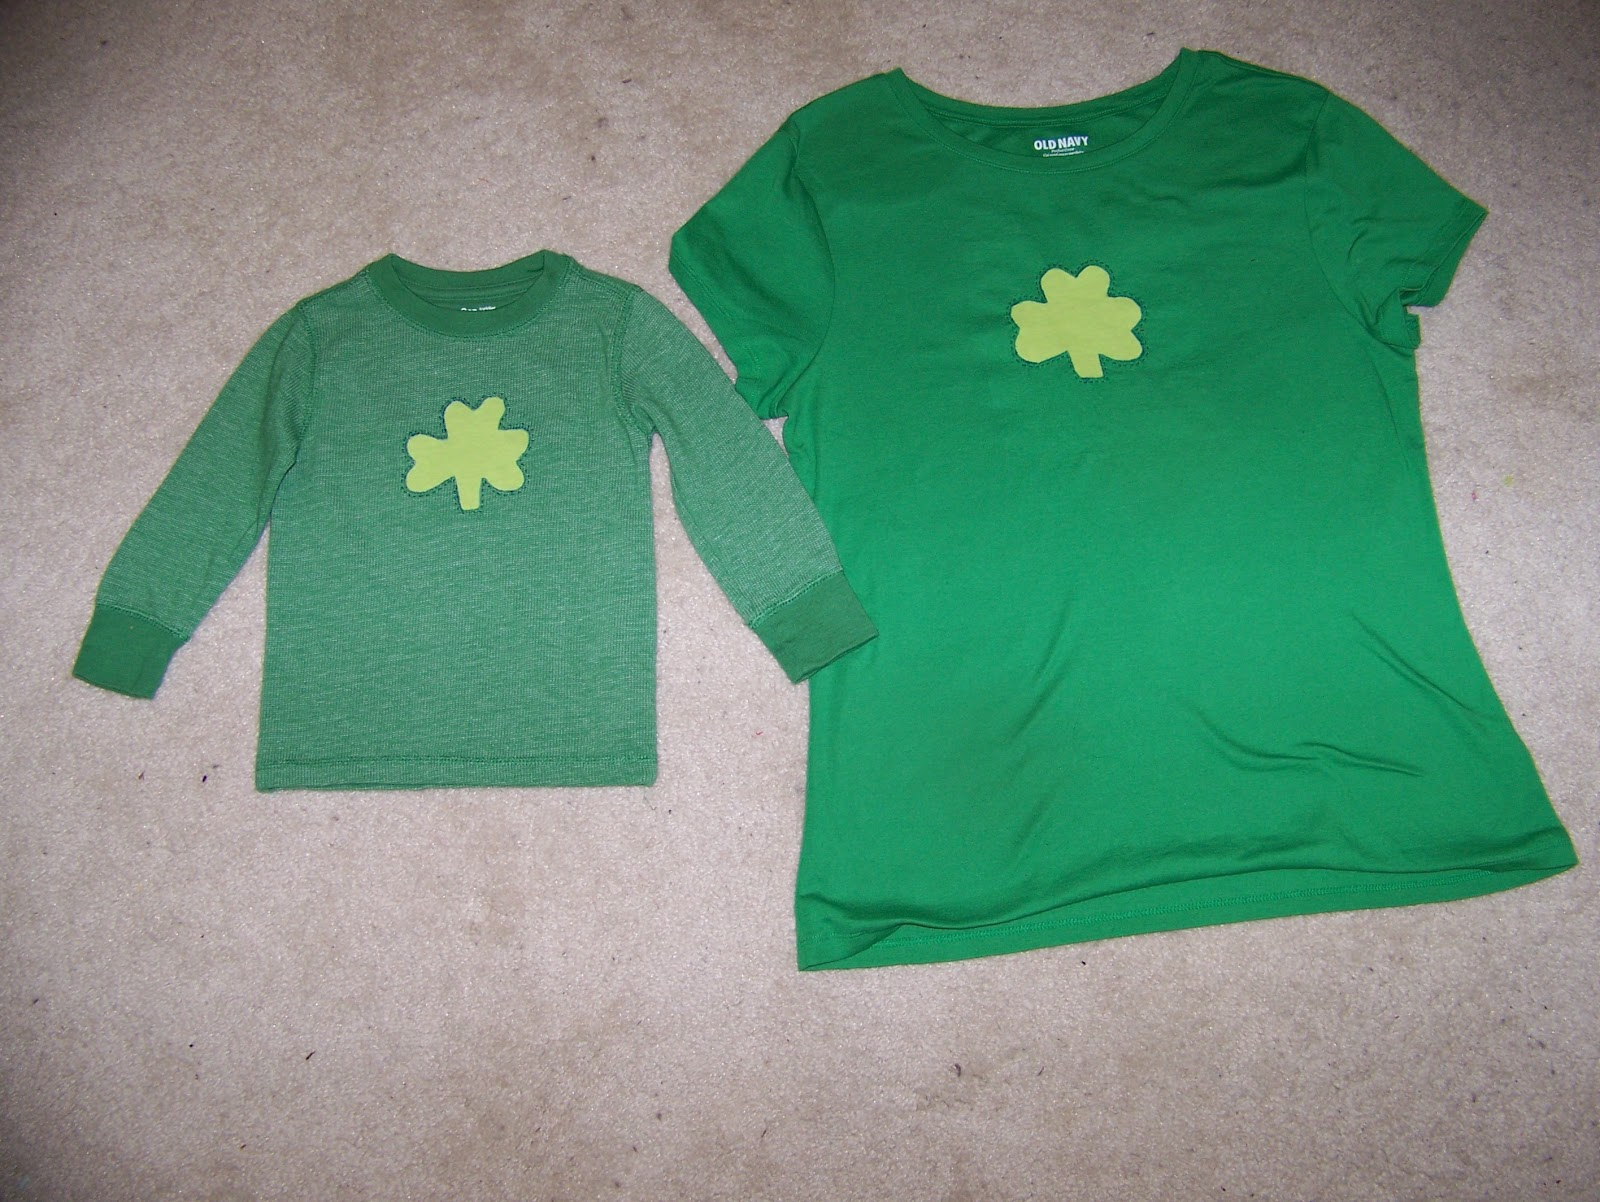 26ca7f044 Making Cooley Stuff: St. Patrick's Day Shirts